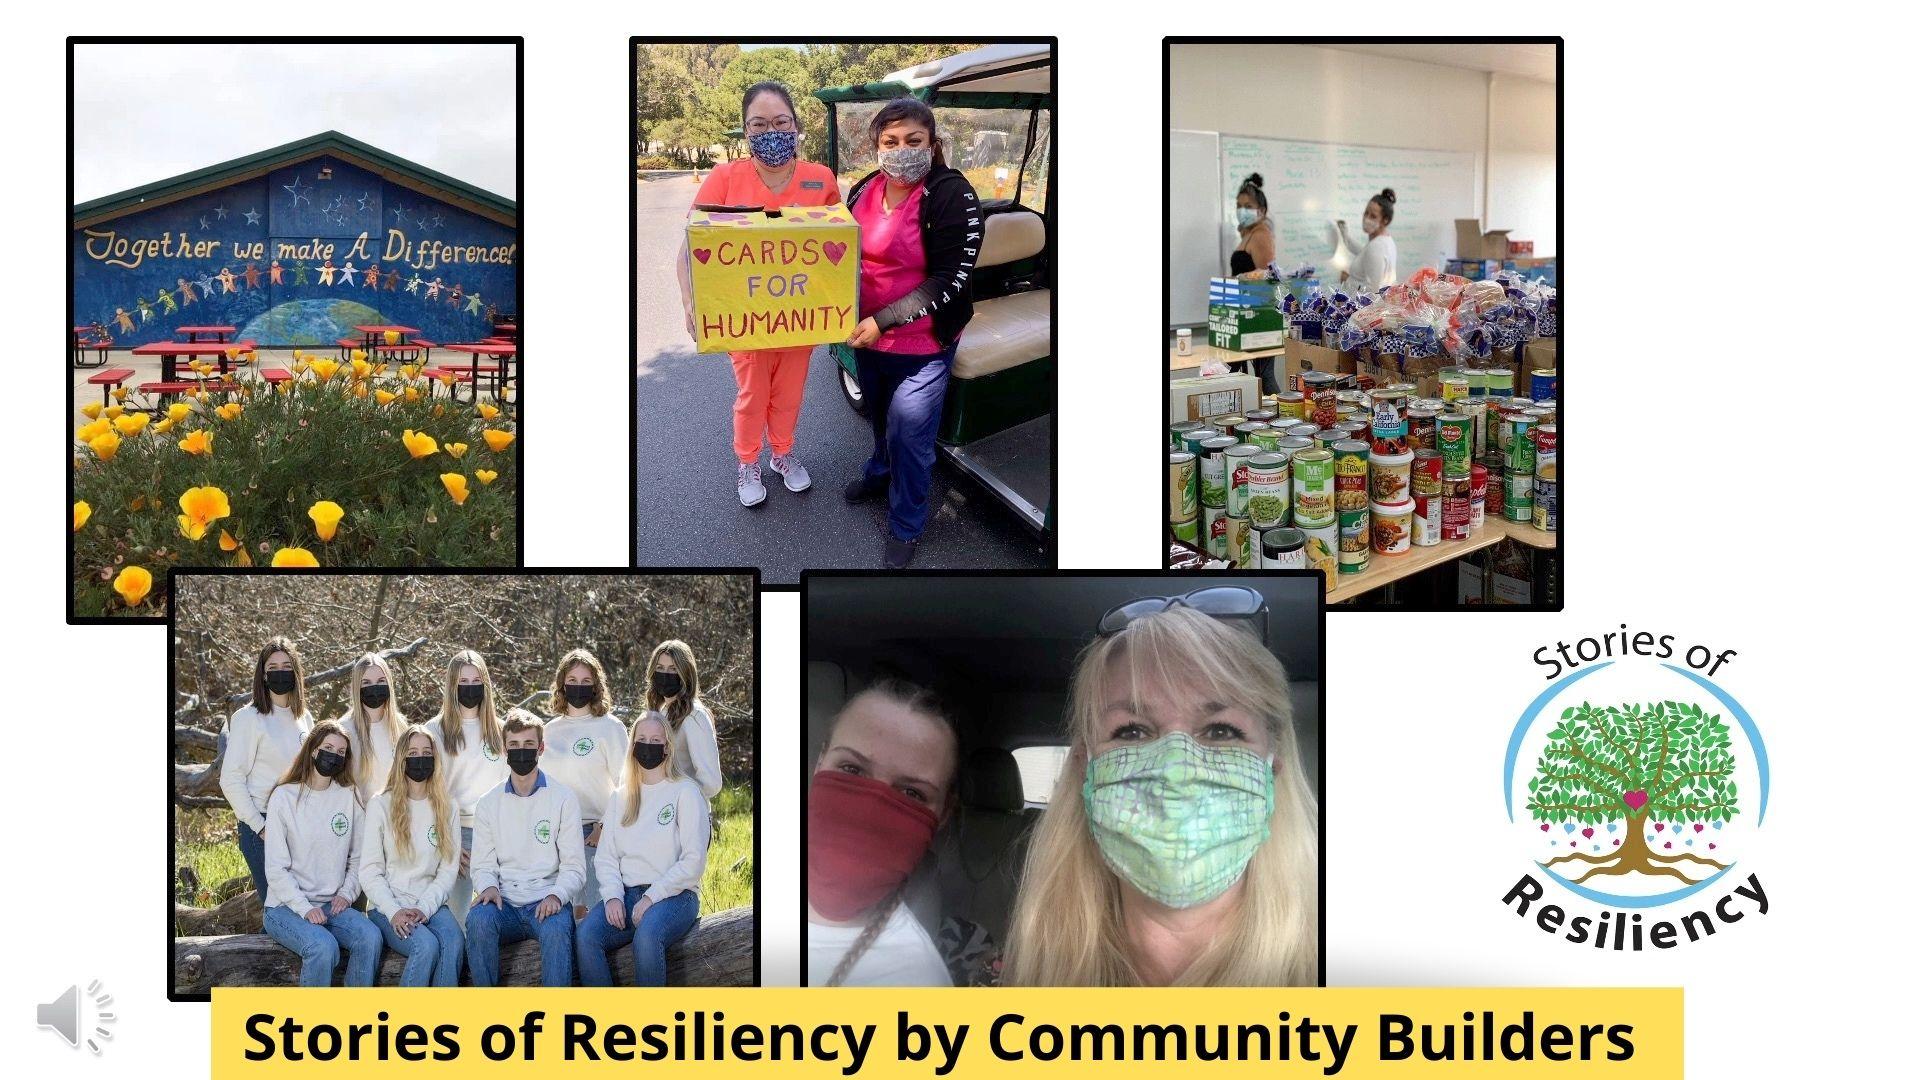 Stories of Resiliency by Community Builders